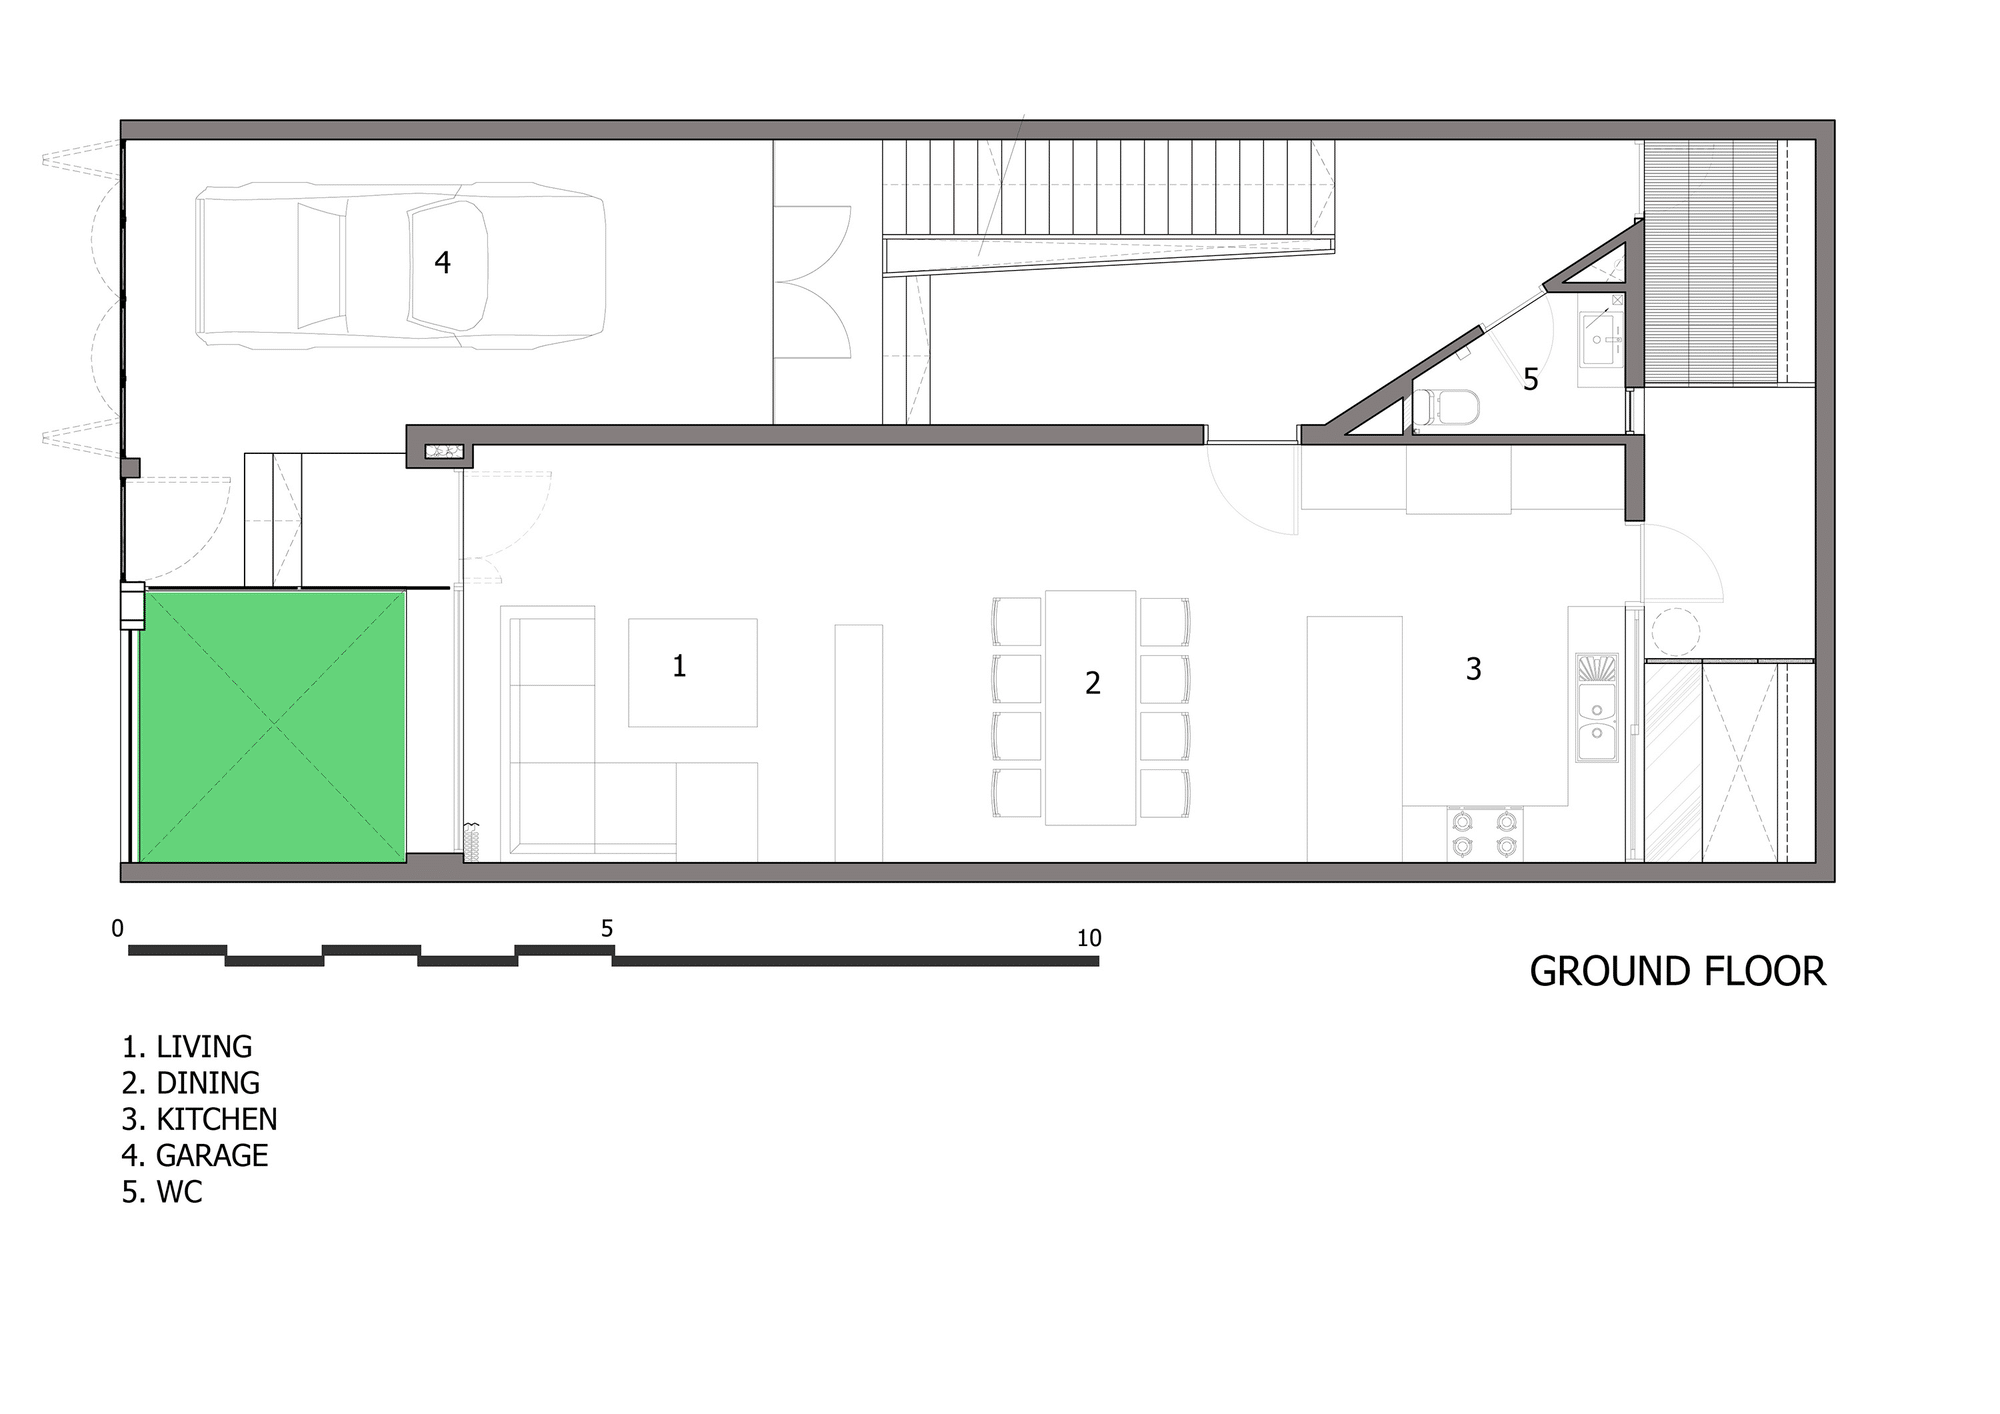 Dise o de casa moderna de tres pisos planos y fachada for Imagenes de planos de casas